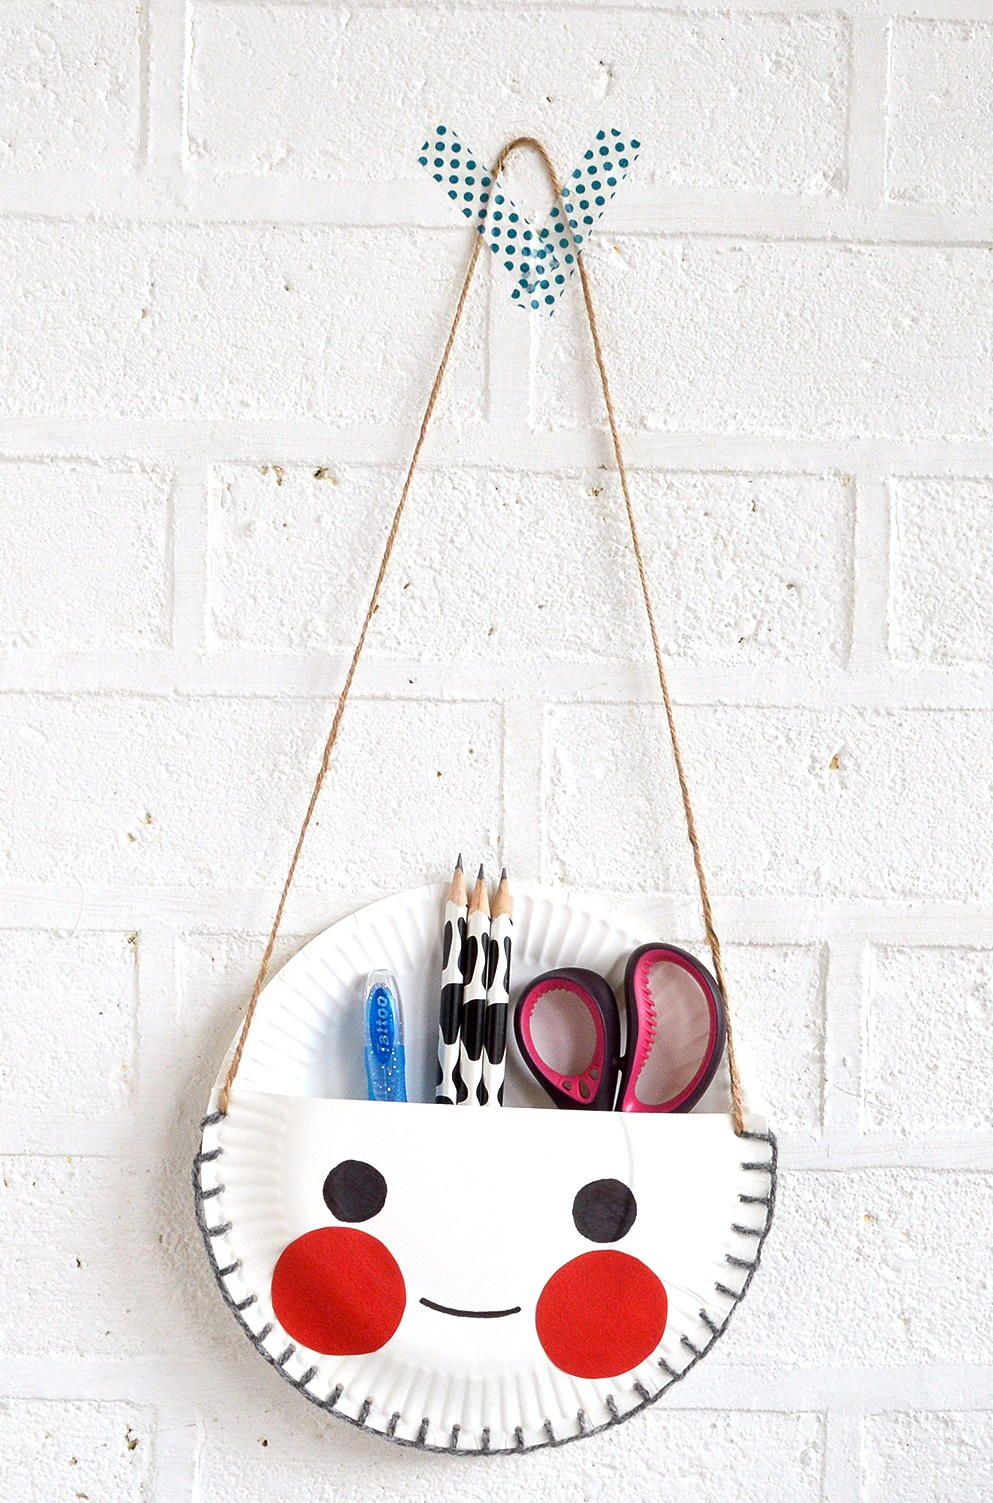 Paper Plate Craft Ideas For Kids Part - 46: AllFreeKidsCrafts